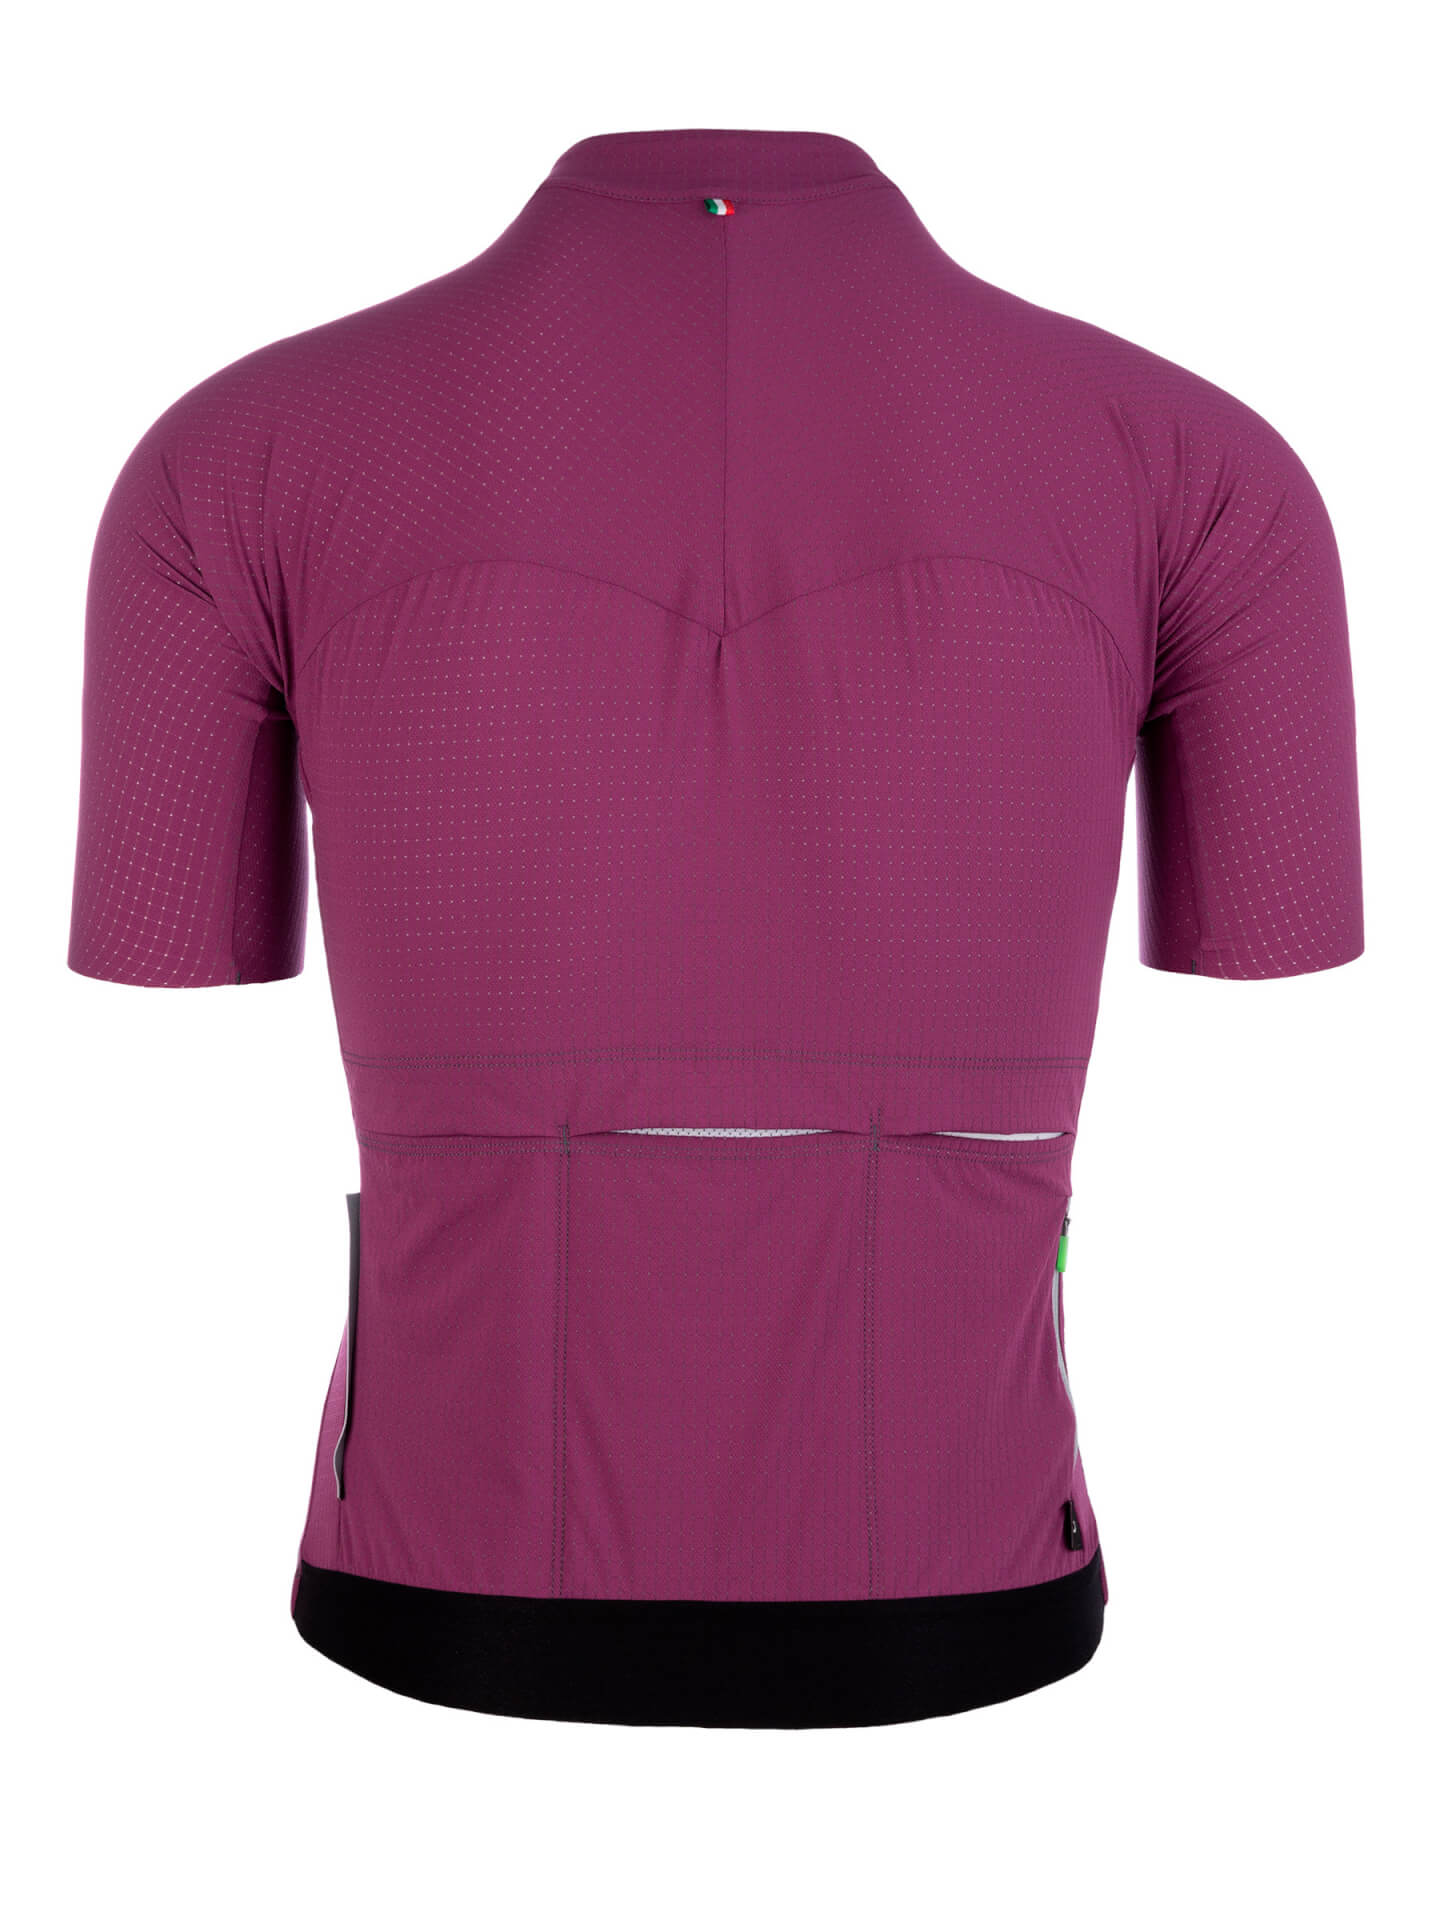 Maillot manches courtes L1 Pinstripe X violet